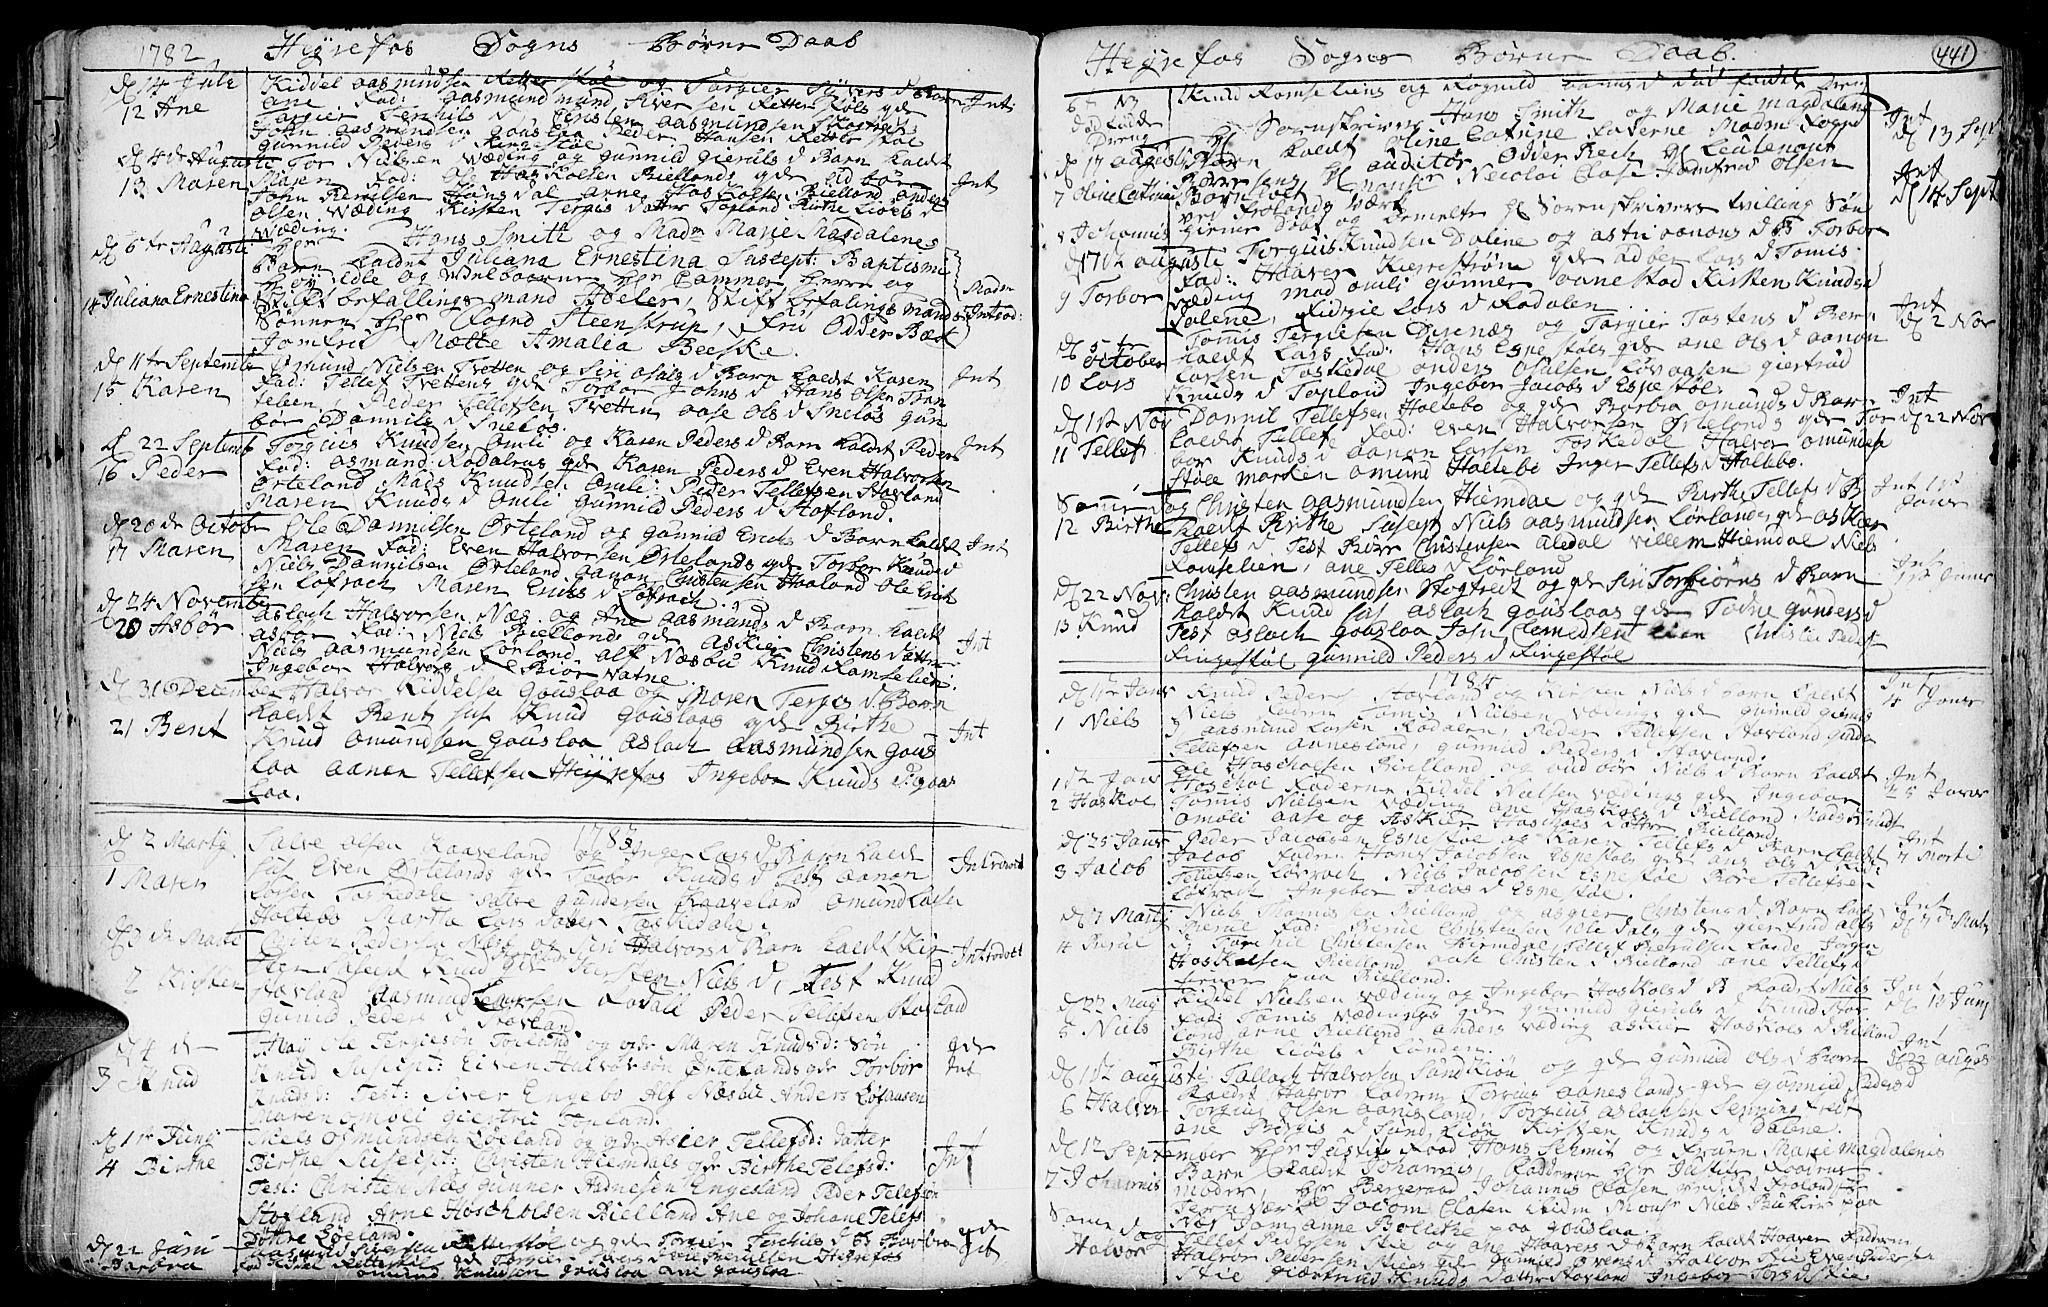 SAK, Hommedal sokneprestkontor, F/Fa/Fab/L0002: Ministerialbok nr. A 2 /3, 1740-1821, s. 441